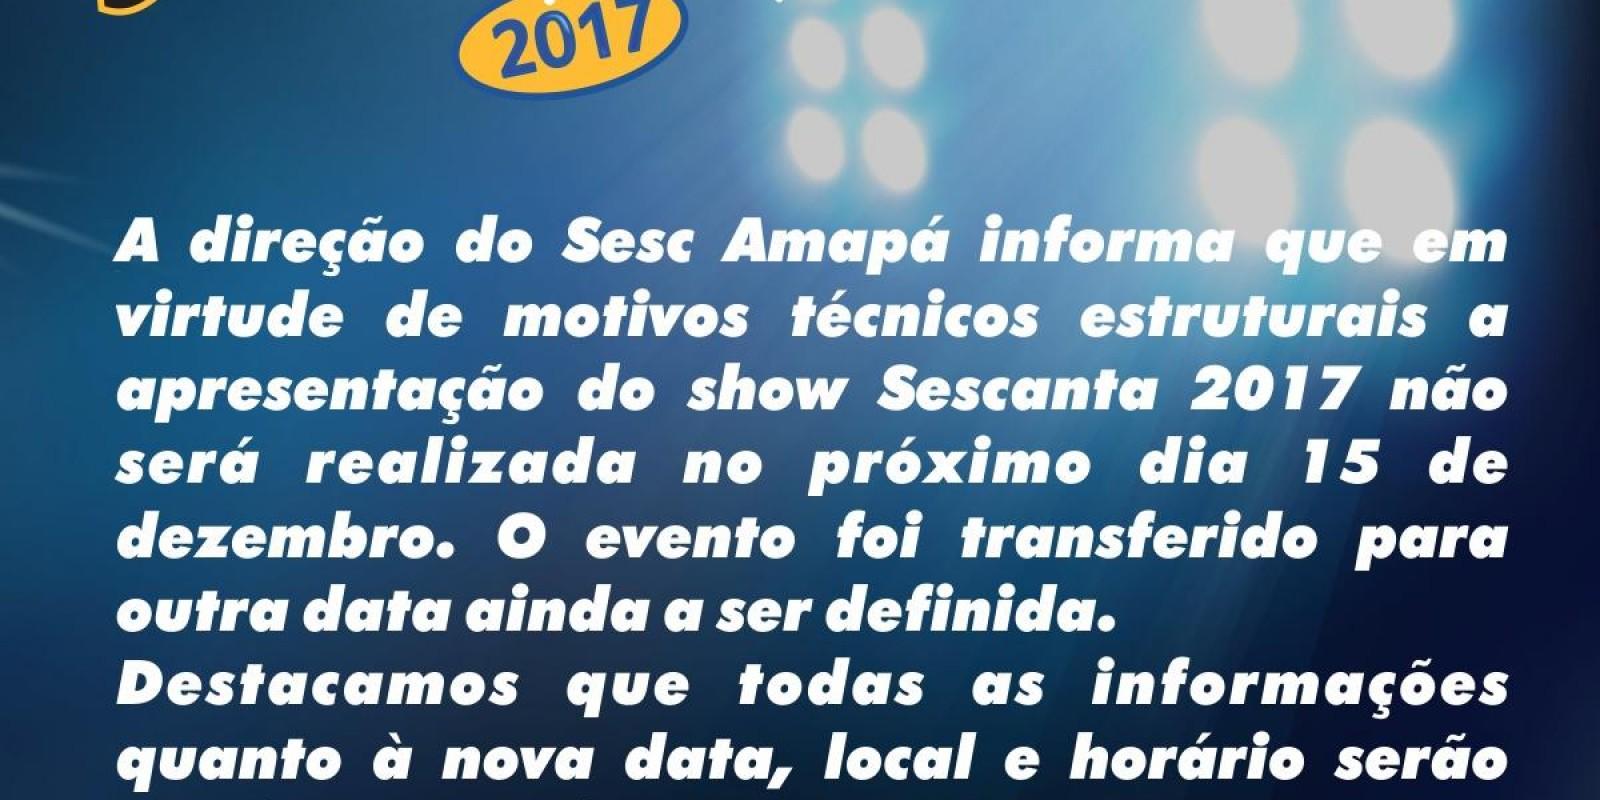 Adiamento show Sescanta 2017